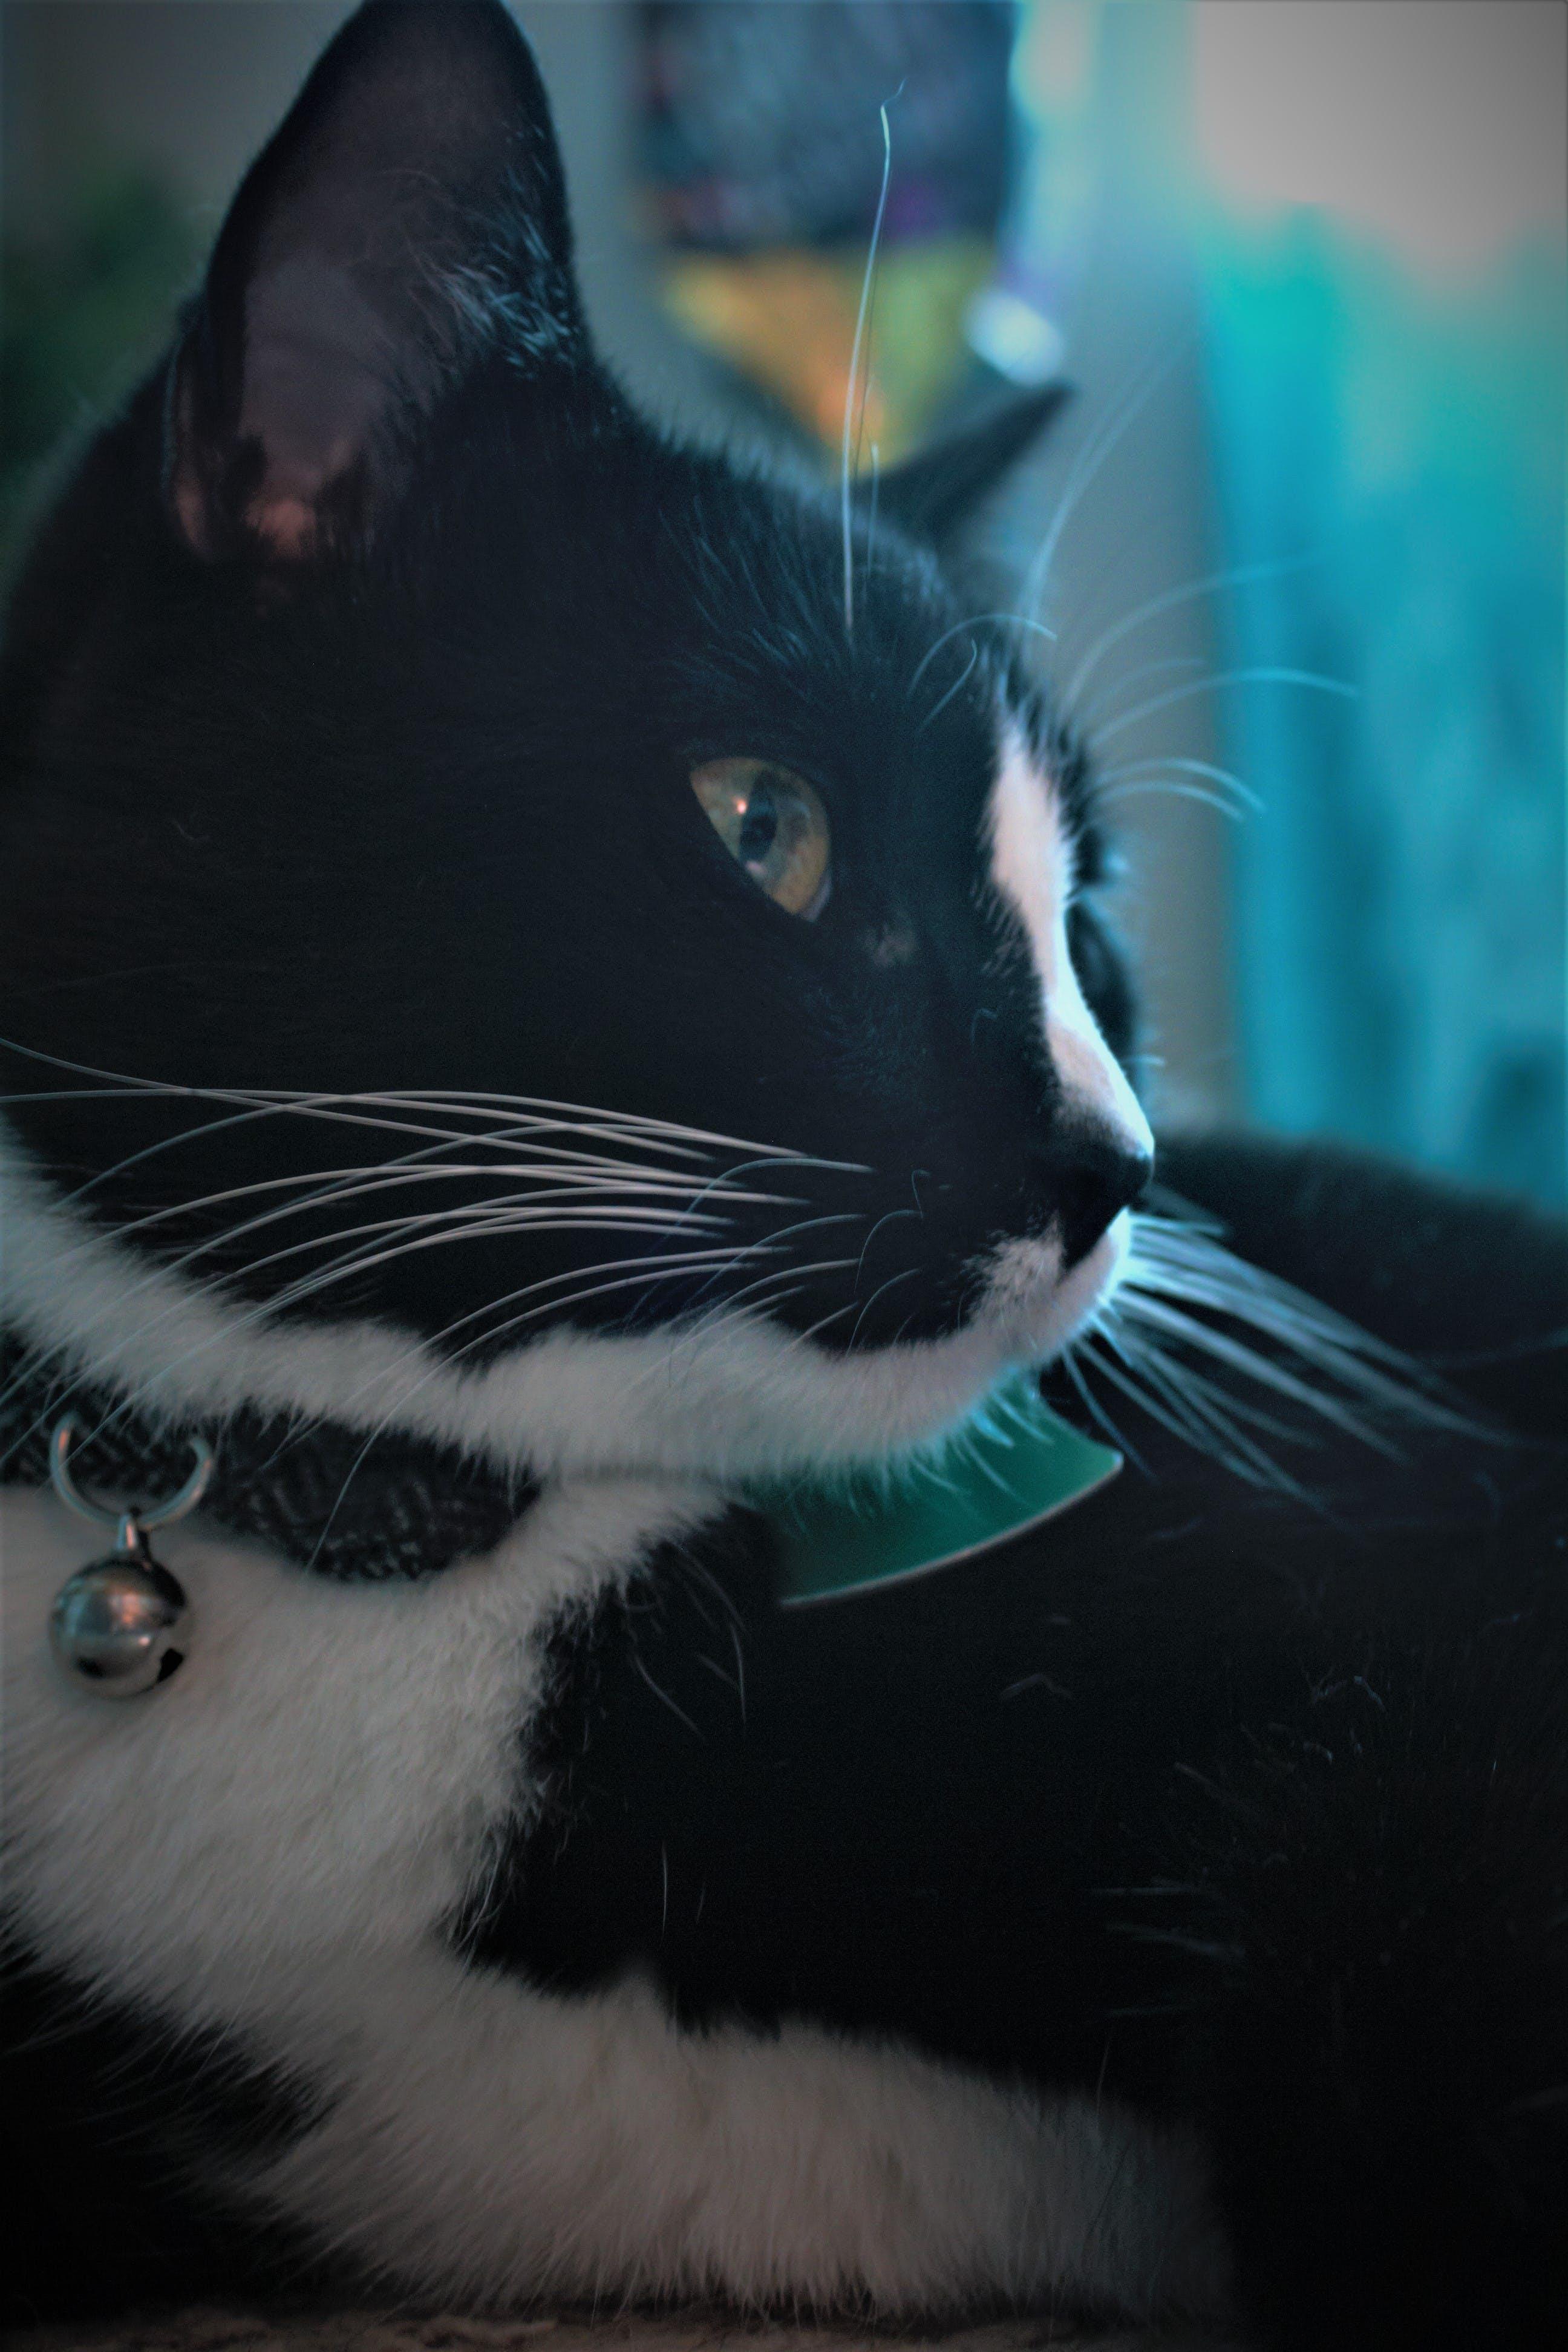 Free stock photo of black and white, cat, kitten, male cat